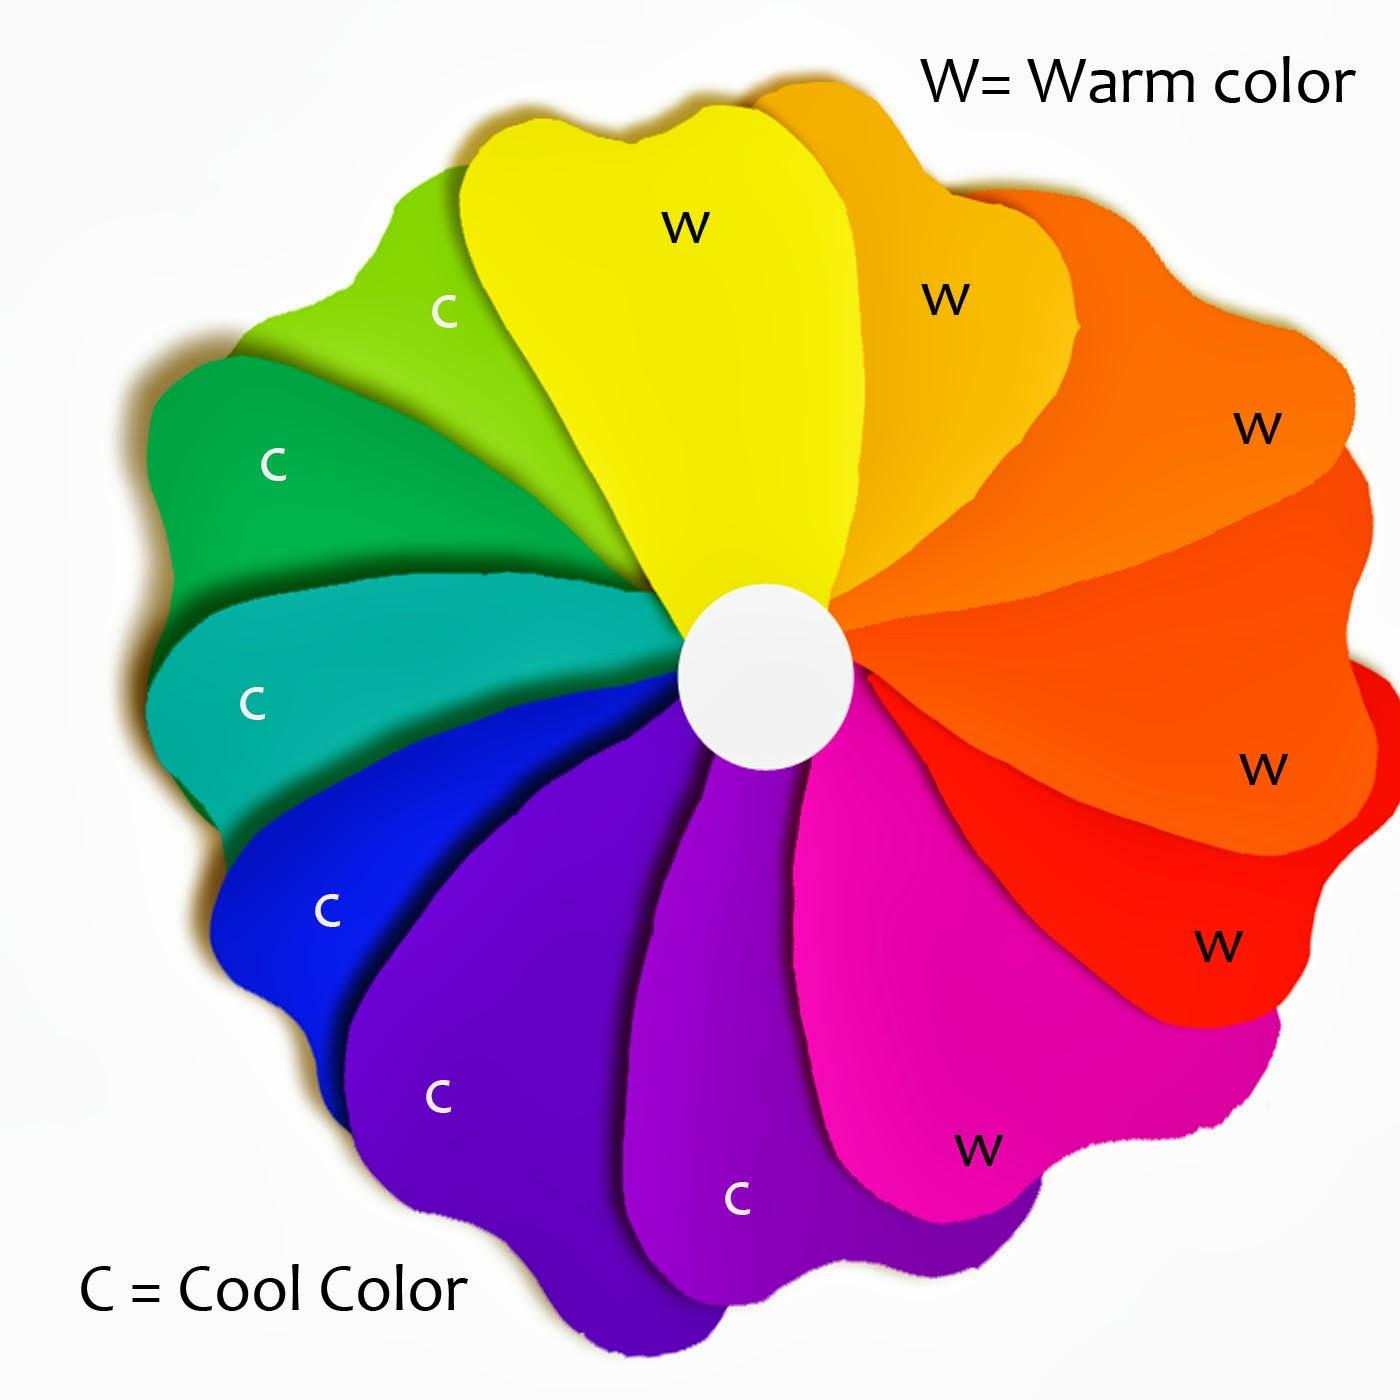 perricone design design works color theory. Black Bedroom Furniture Sets. Home Design Ideas